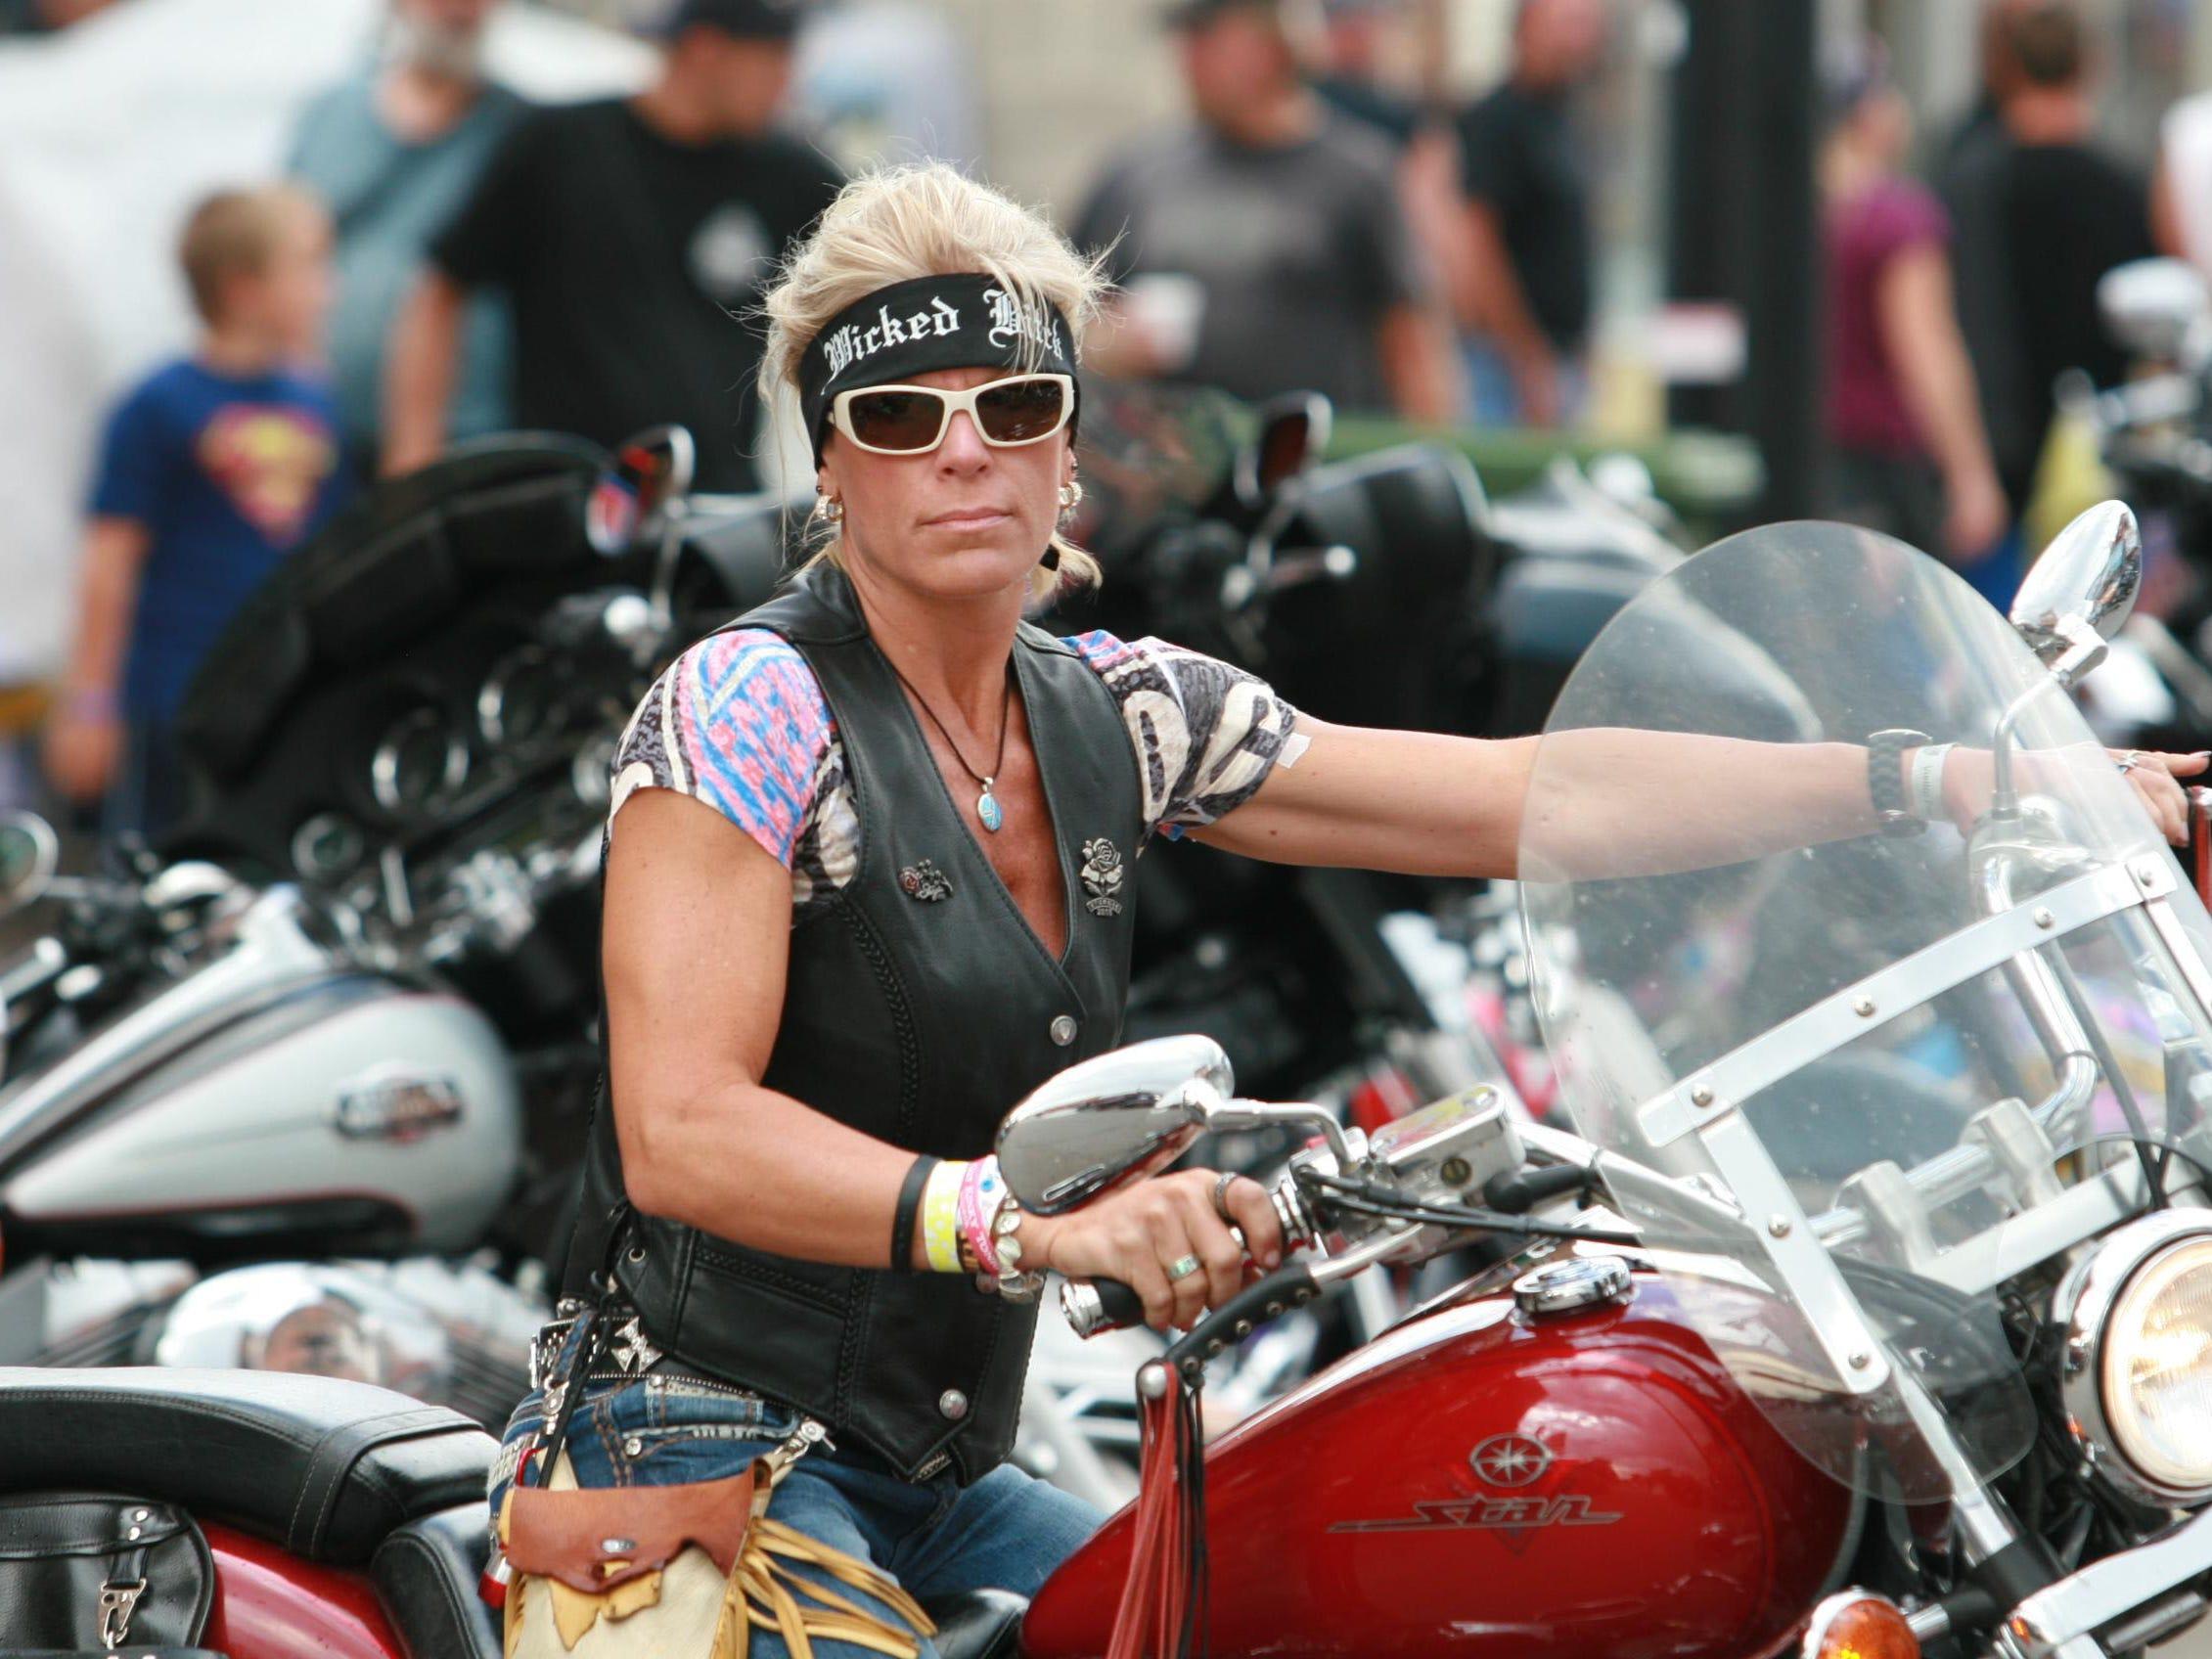 2012: Brenda Clark of Minneapolis rides on Lazelle Street in Sturgis.